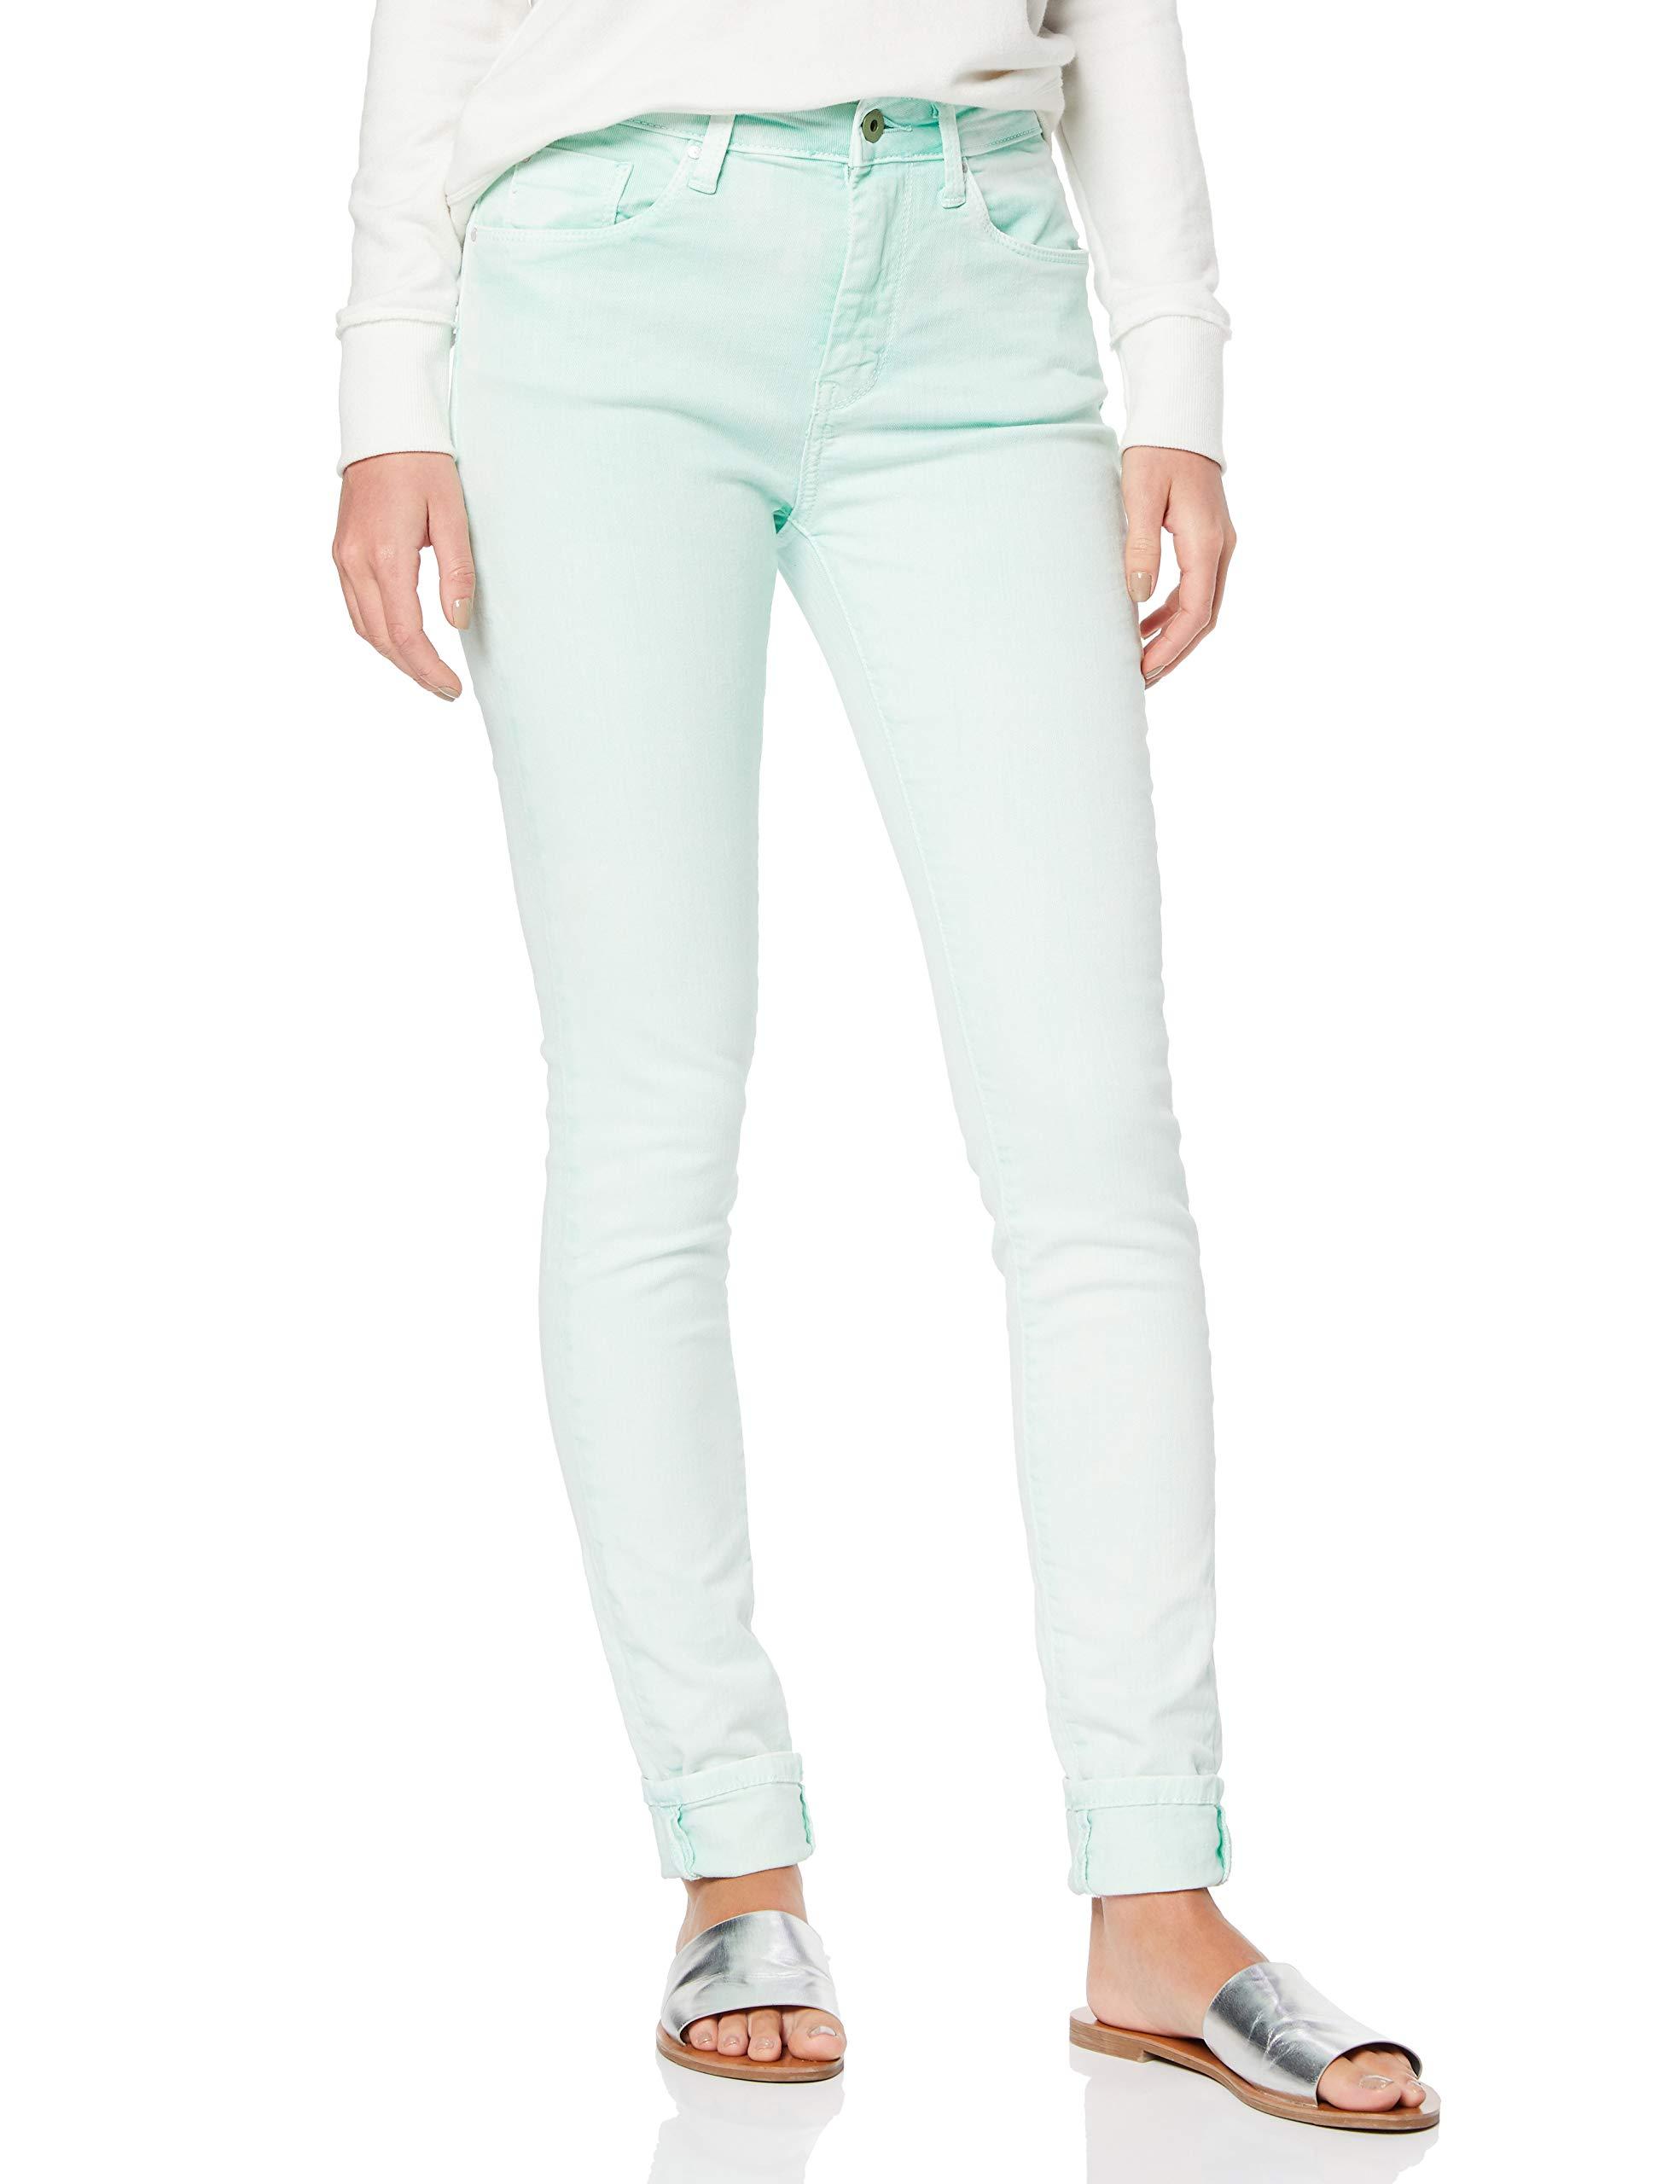 w25 Pepe Regent Green 640taille Jeans PantalonVertsea l30Femme Fabricant bgvf7yY6